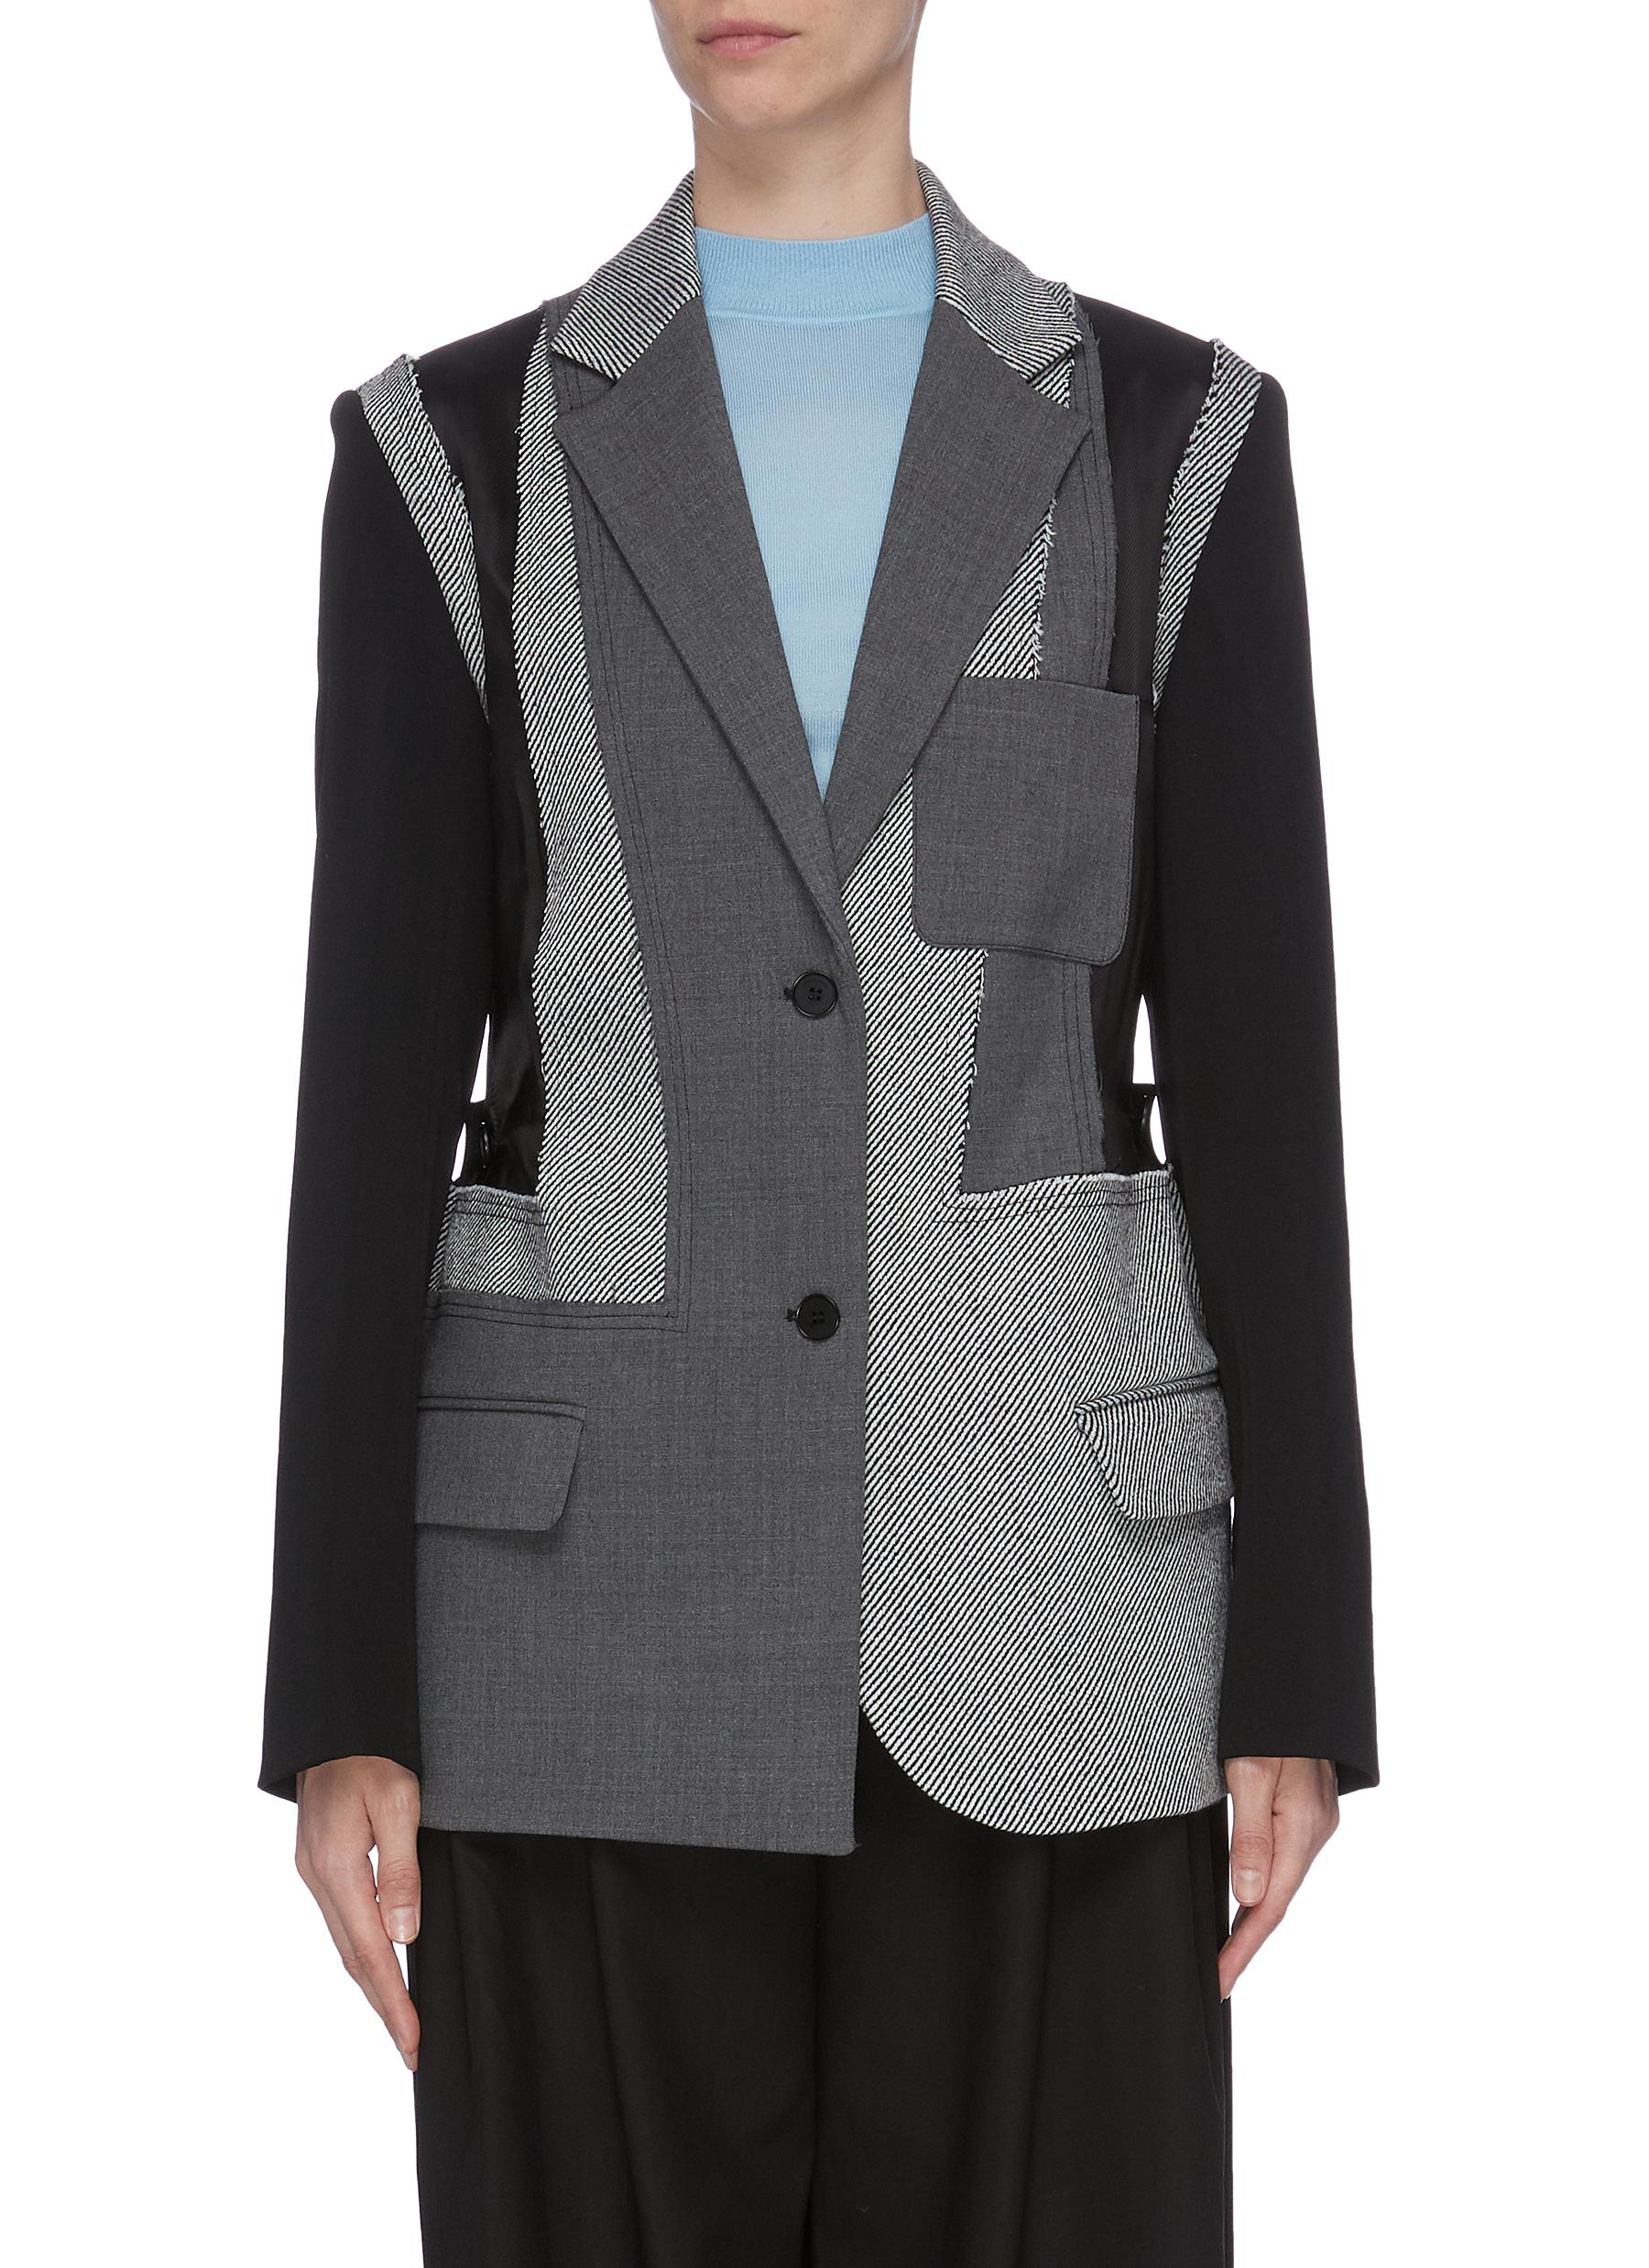 Patchwork blazer by Jw Anderson